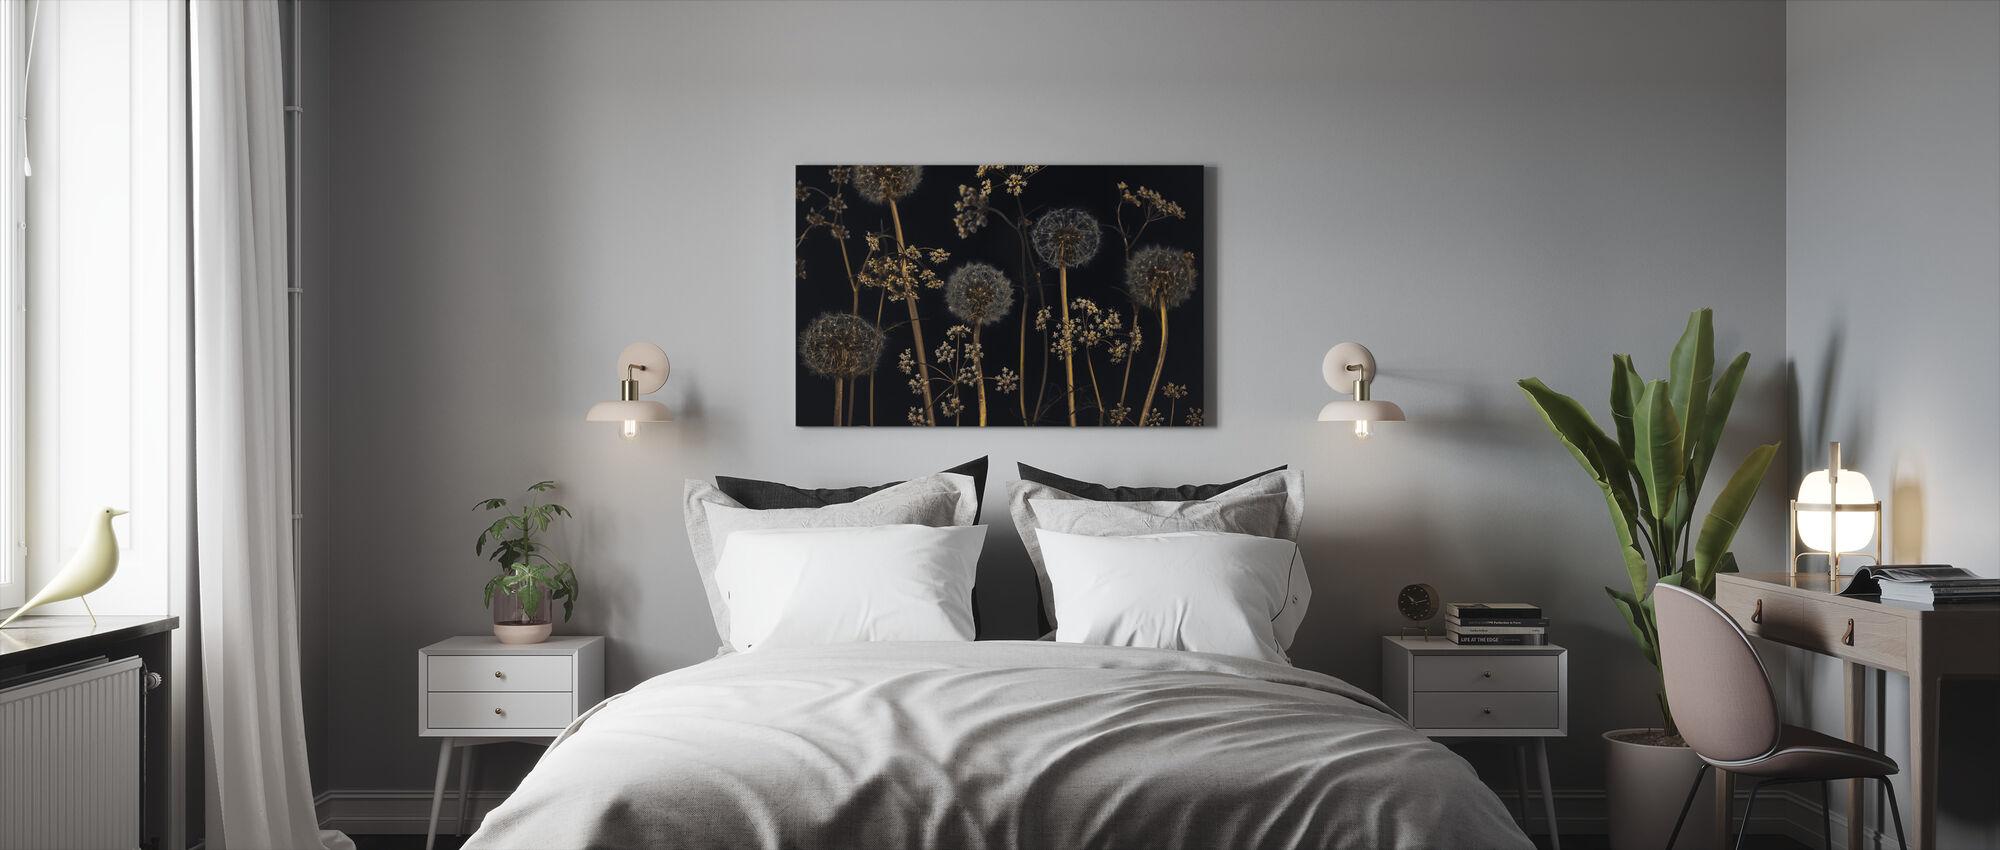 Weide Bloemen - Zwart - Canvas print - Slaapkamer